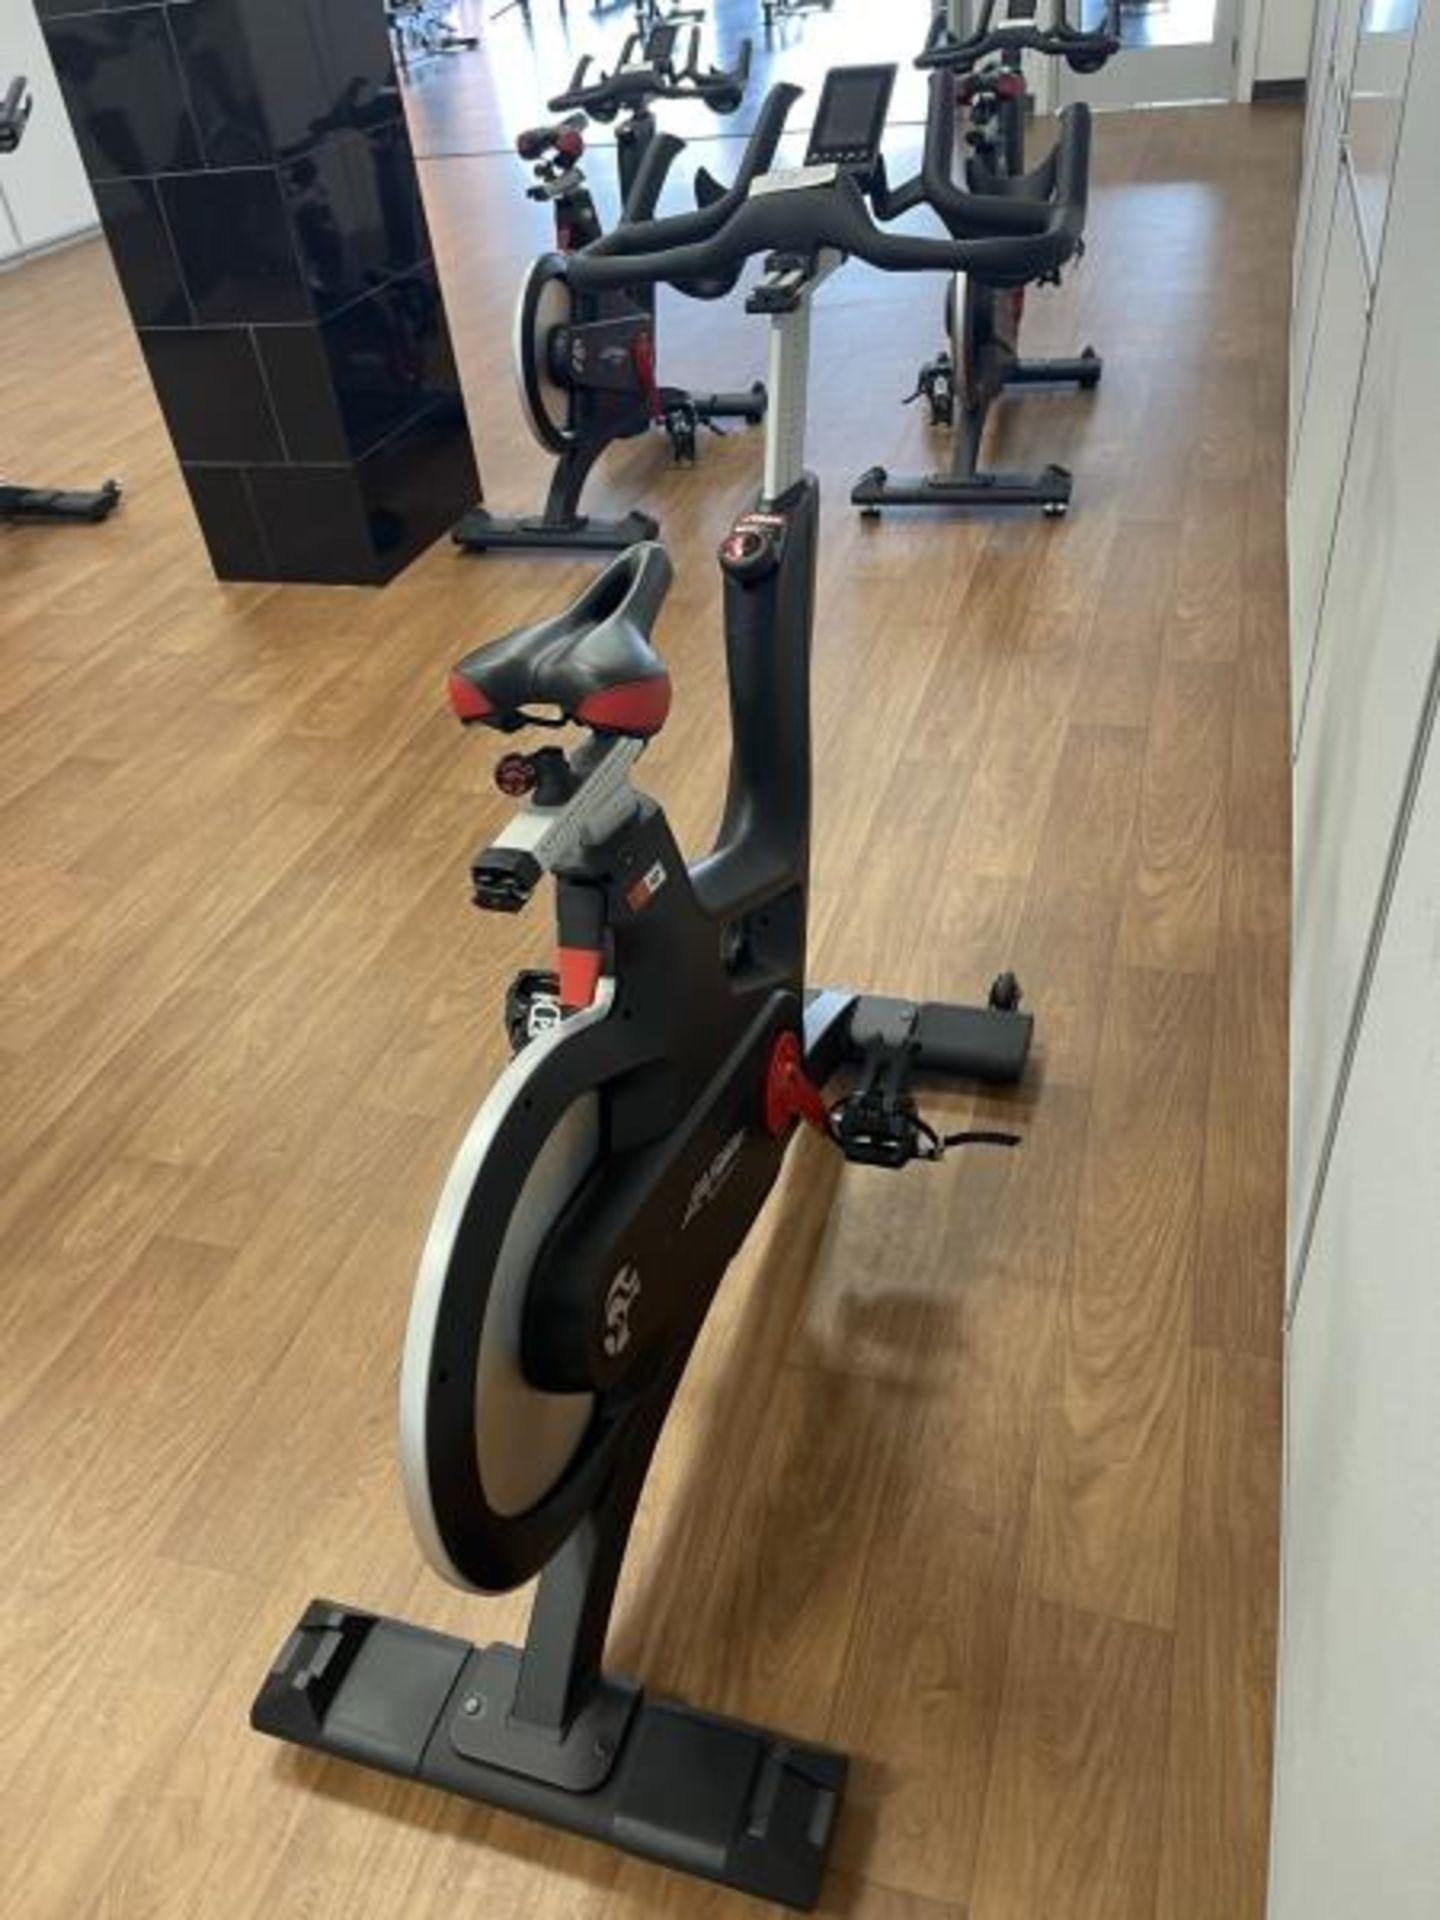 2018 Life Fitness IC7 ISpin Bike M: IC-LFIC7B2-01 - Image 2 of 3